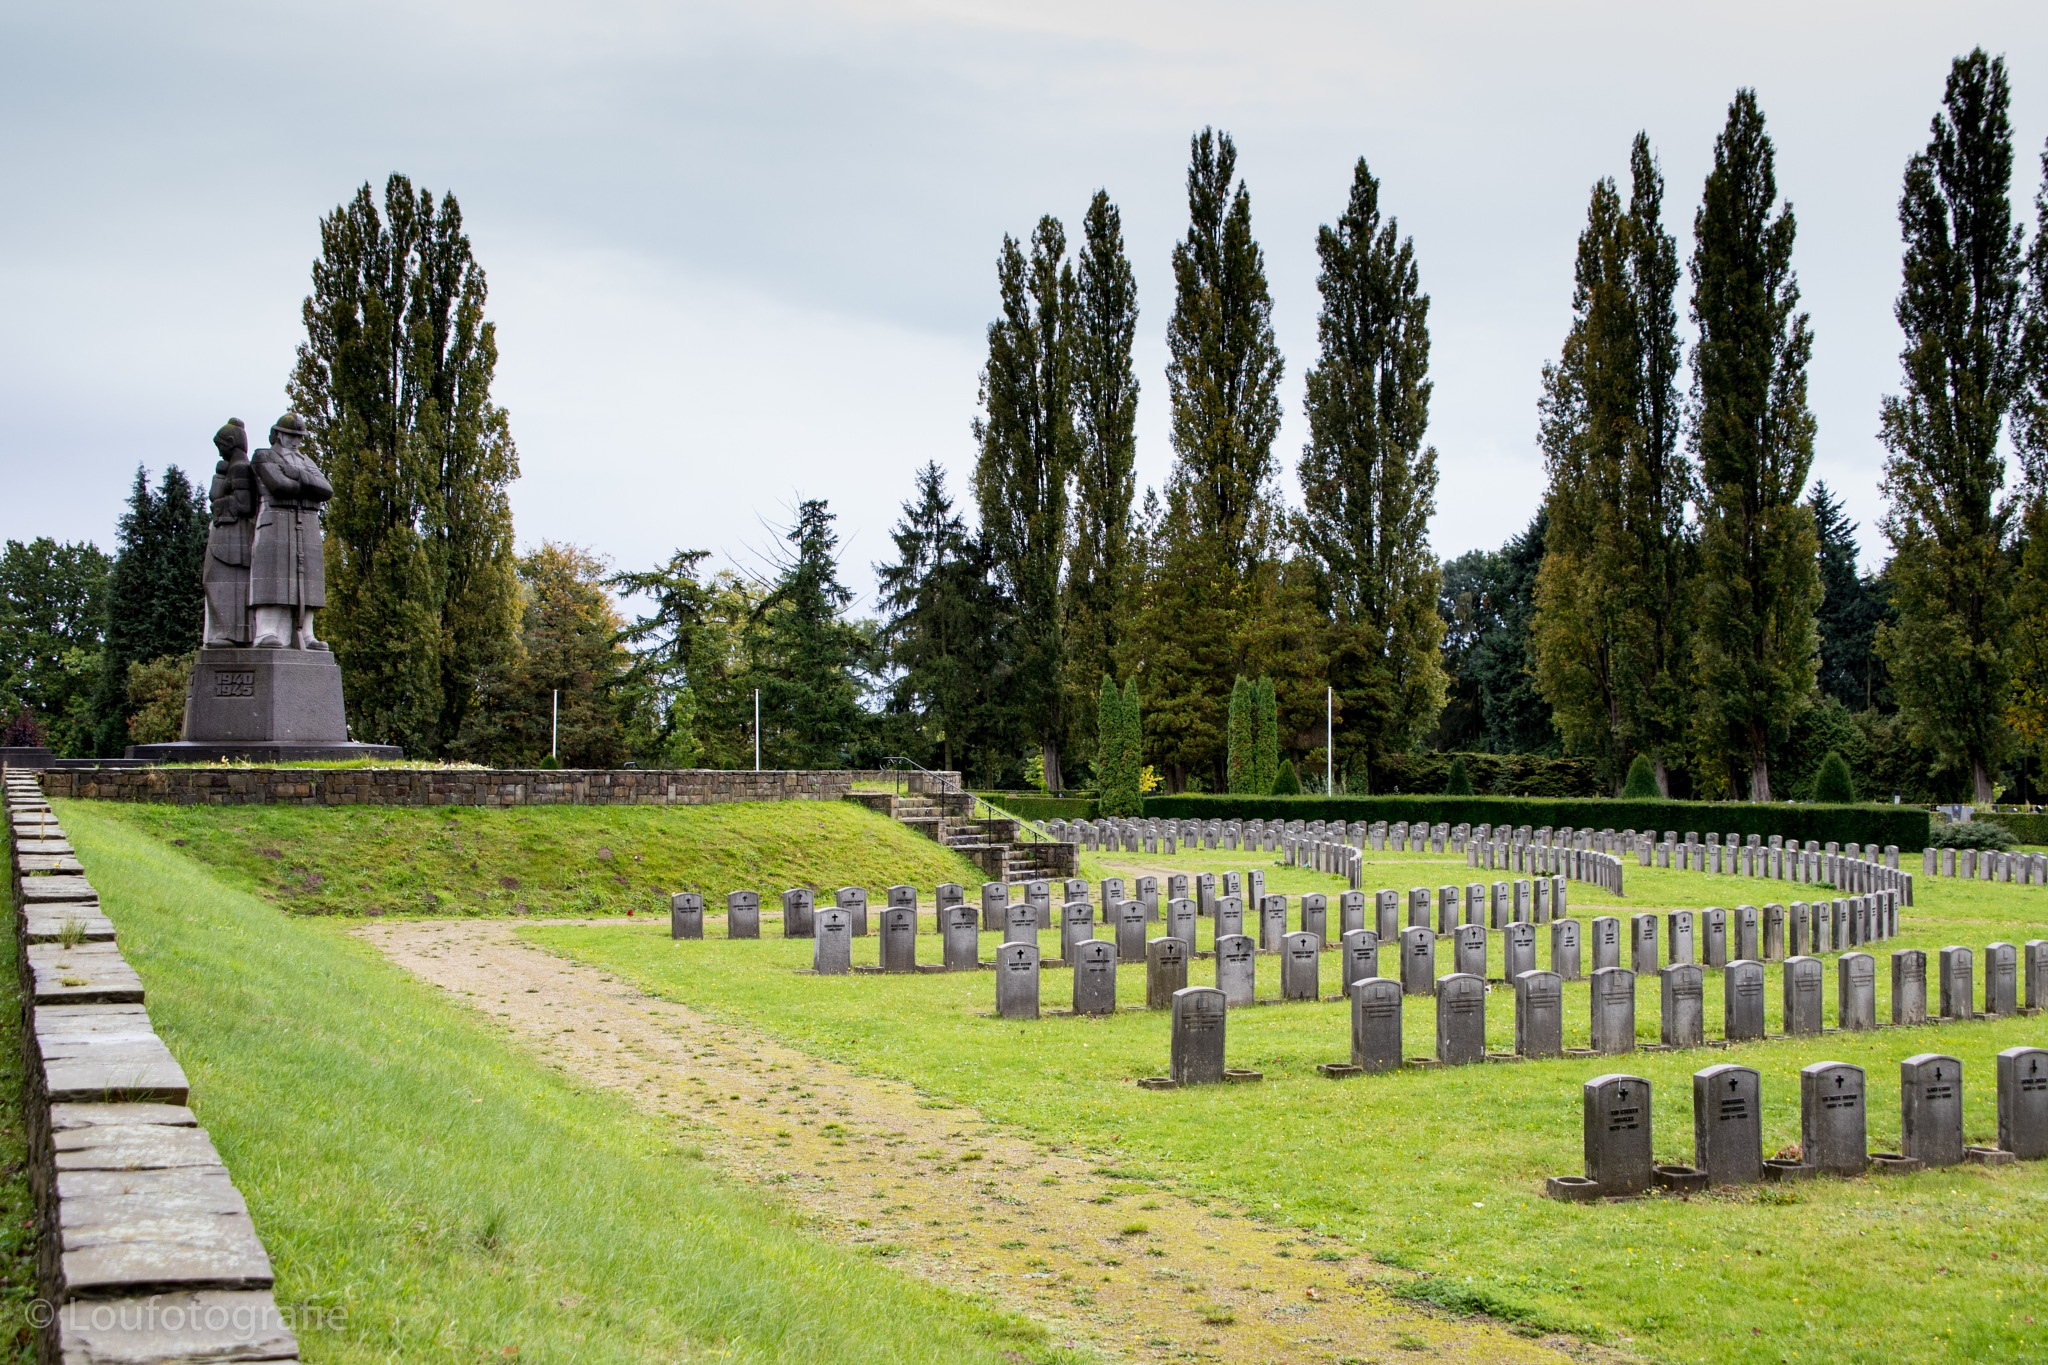 Military graveyard in Vogelensang by Loufotografie